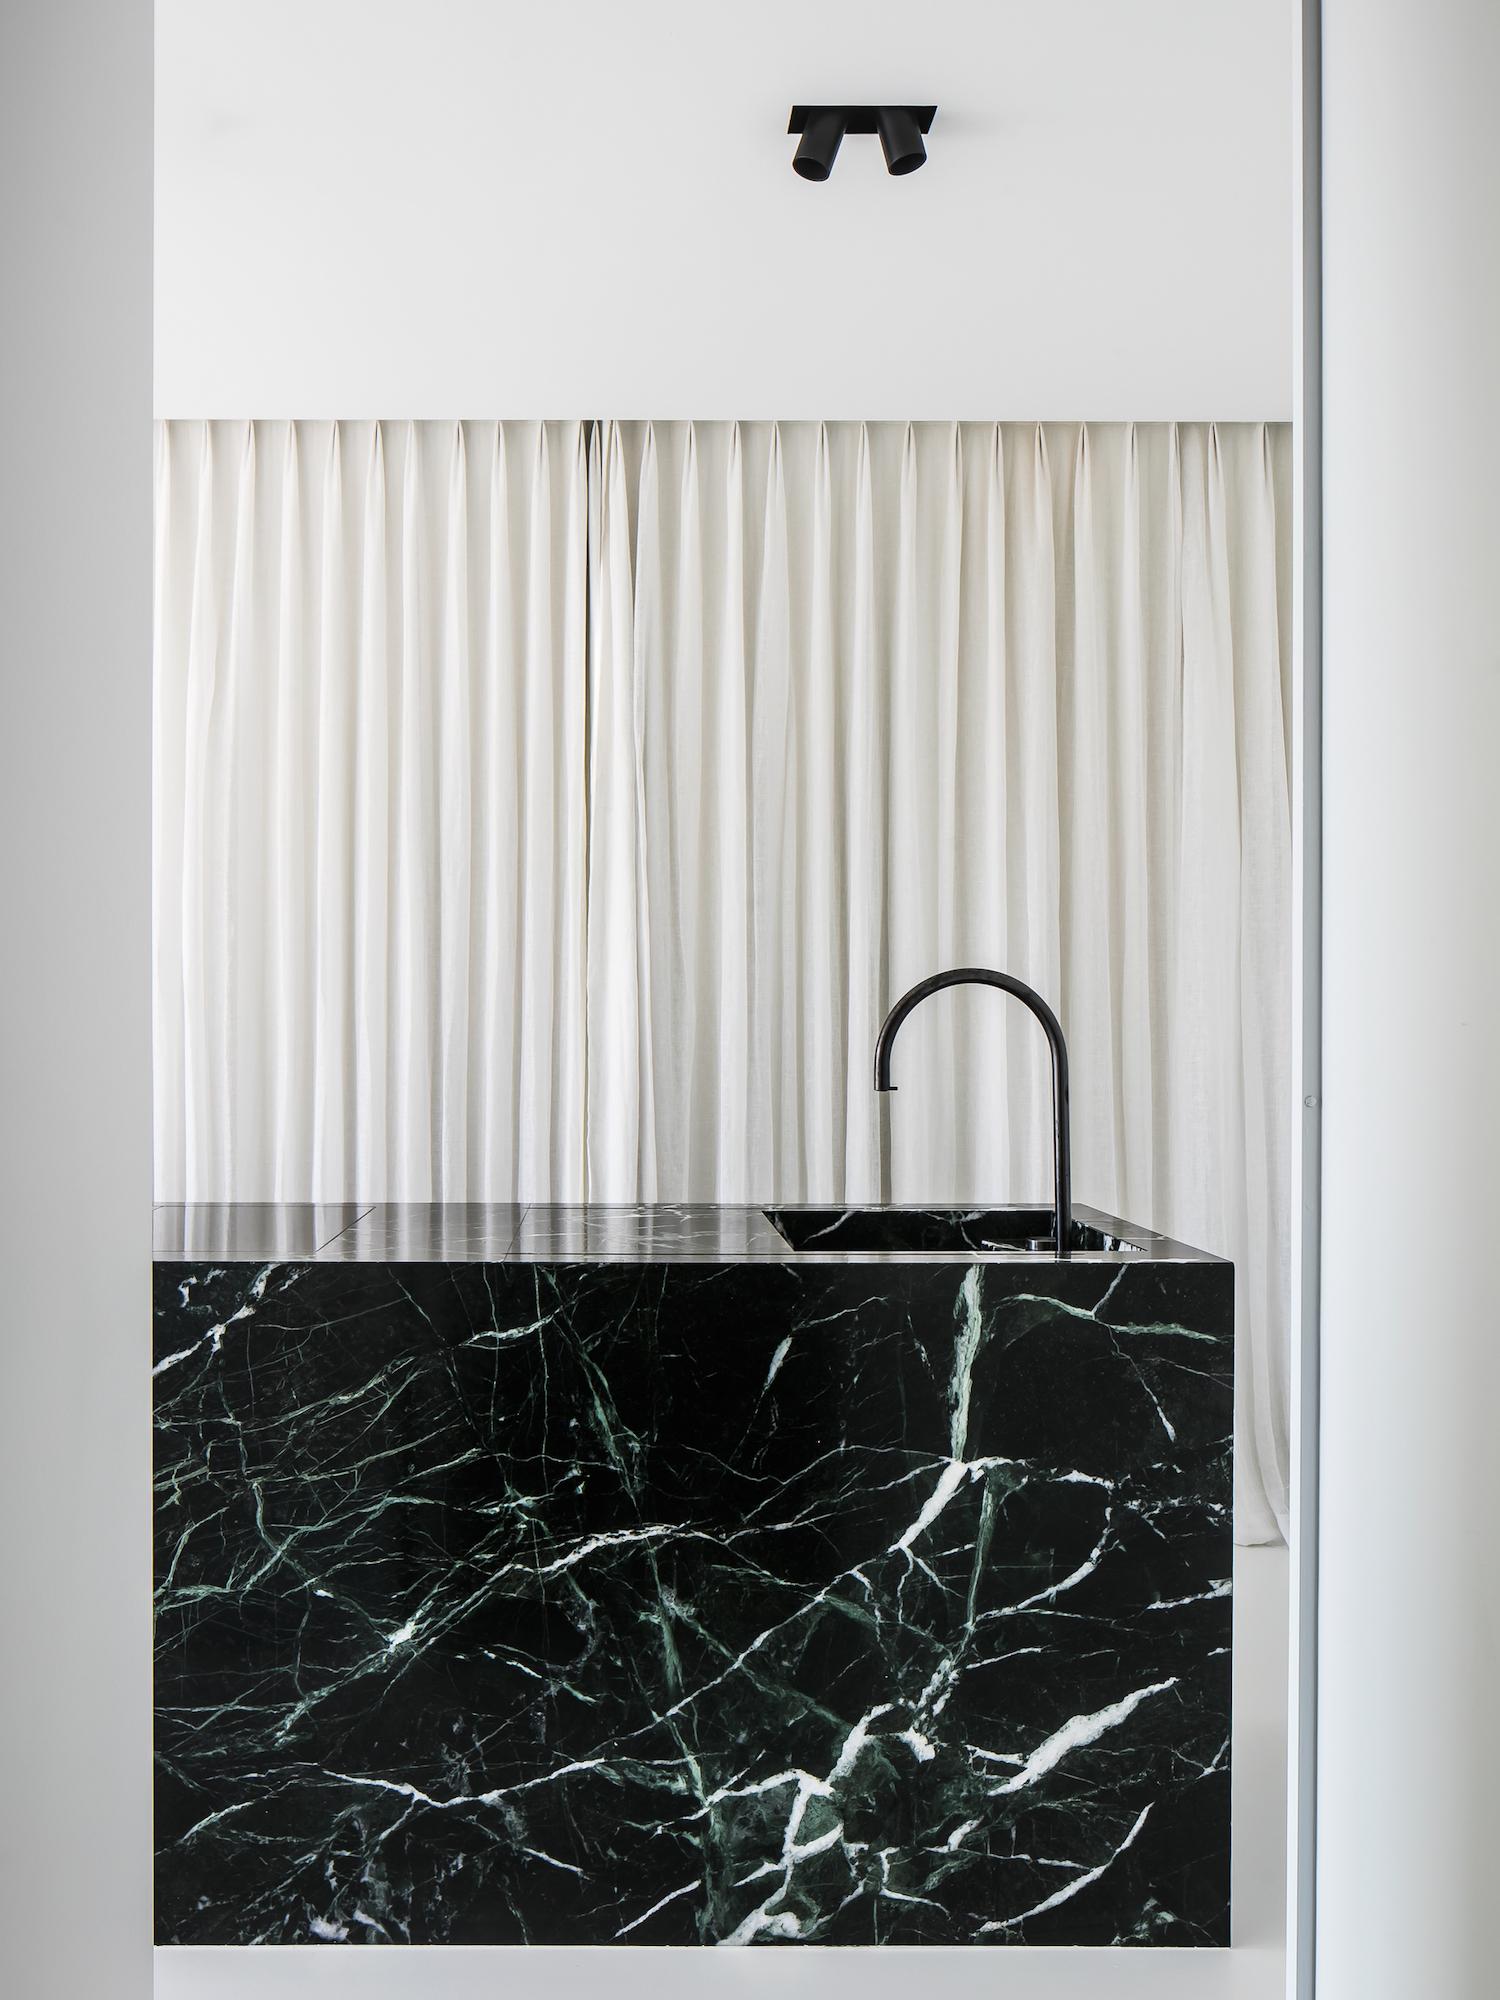 est living minimalist kitchen covet pieter vanrenterghem 1